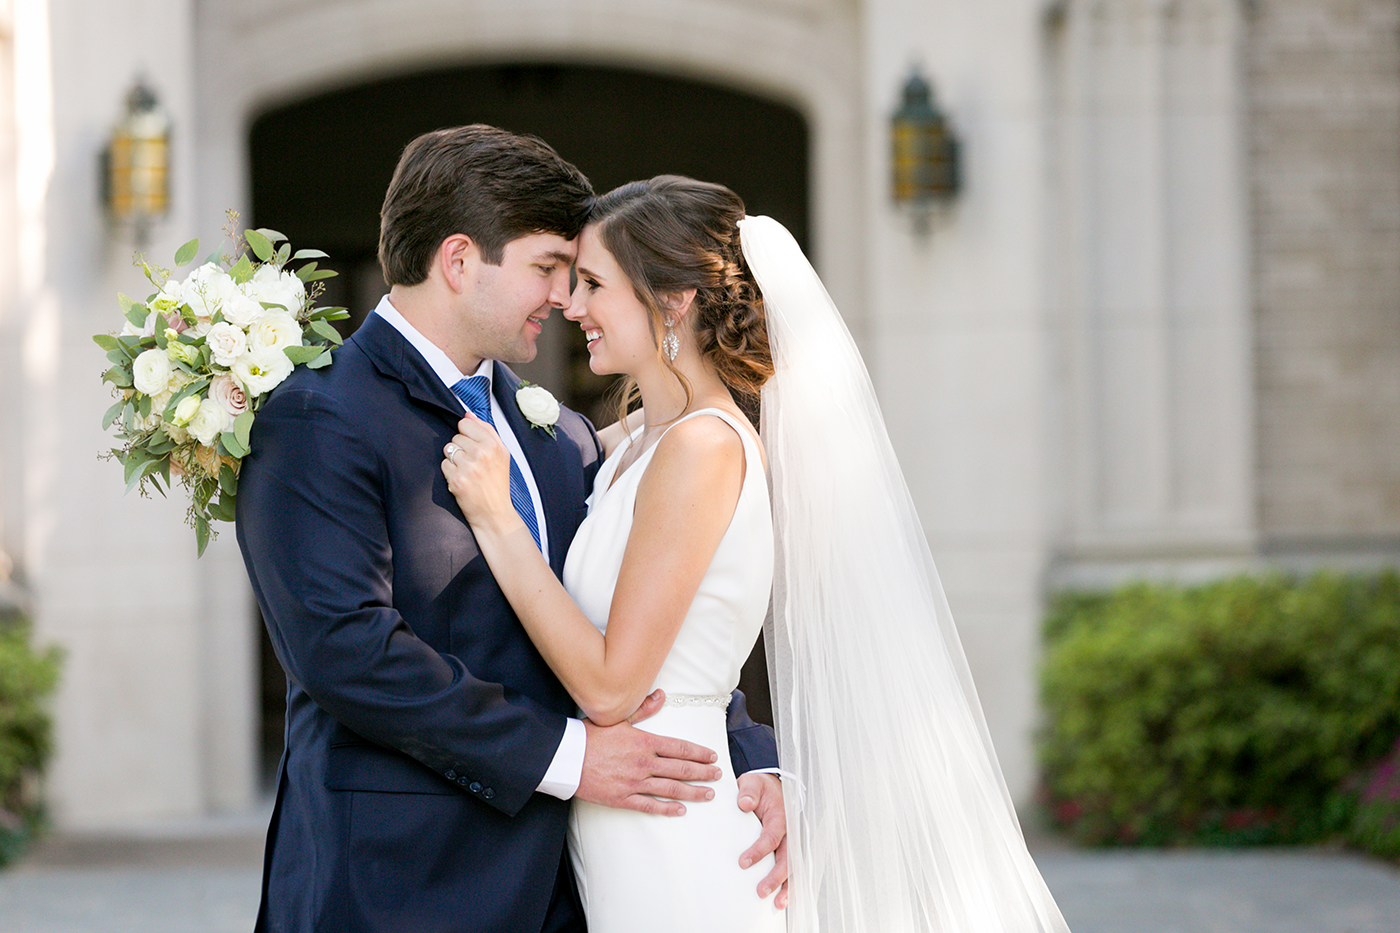 Wedding Planner Dallas TX - Allday Events - Highland Park - Marie Gabrielle Wedding - 267.jpg